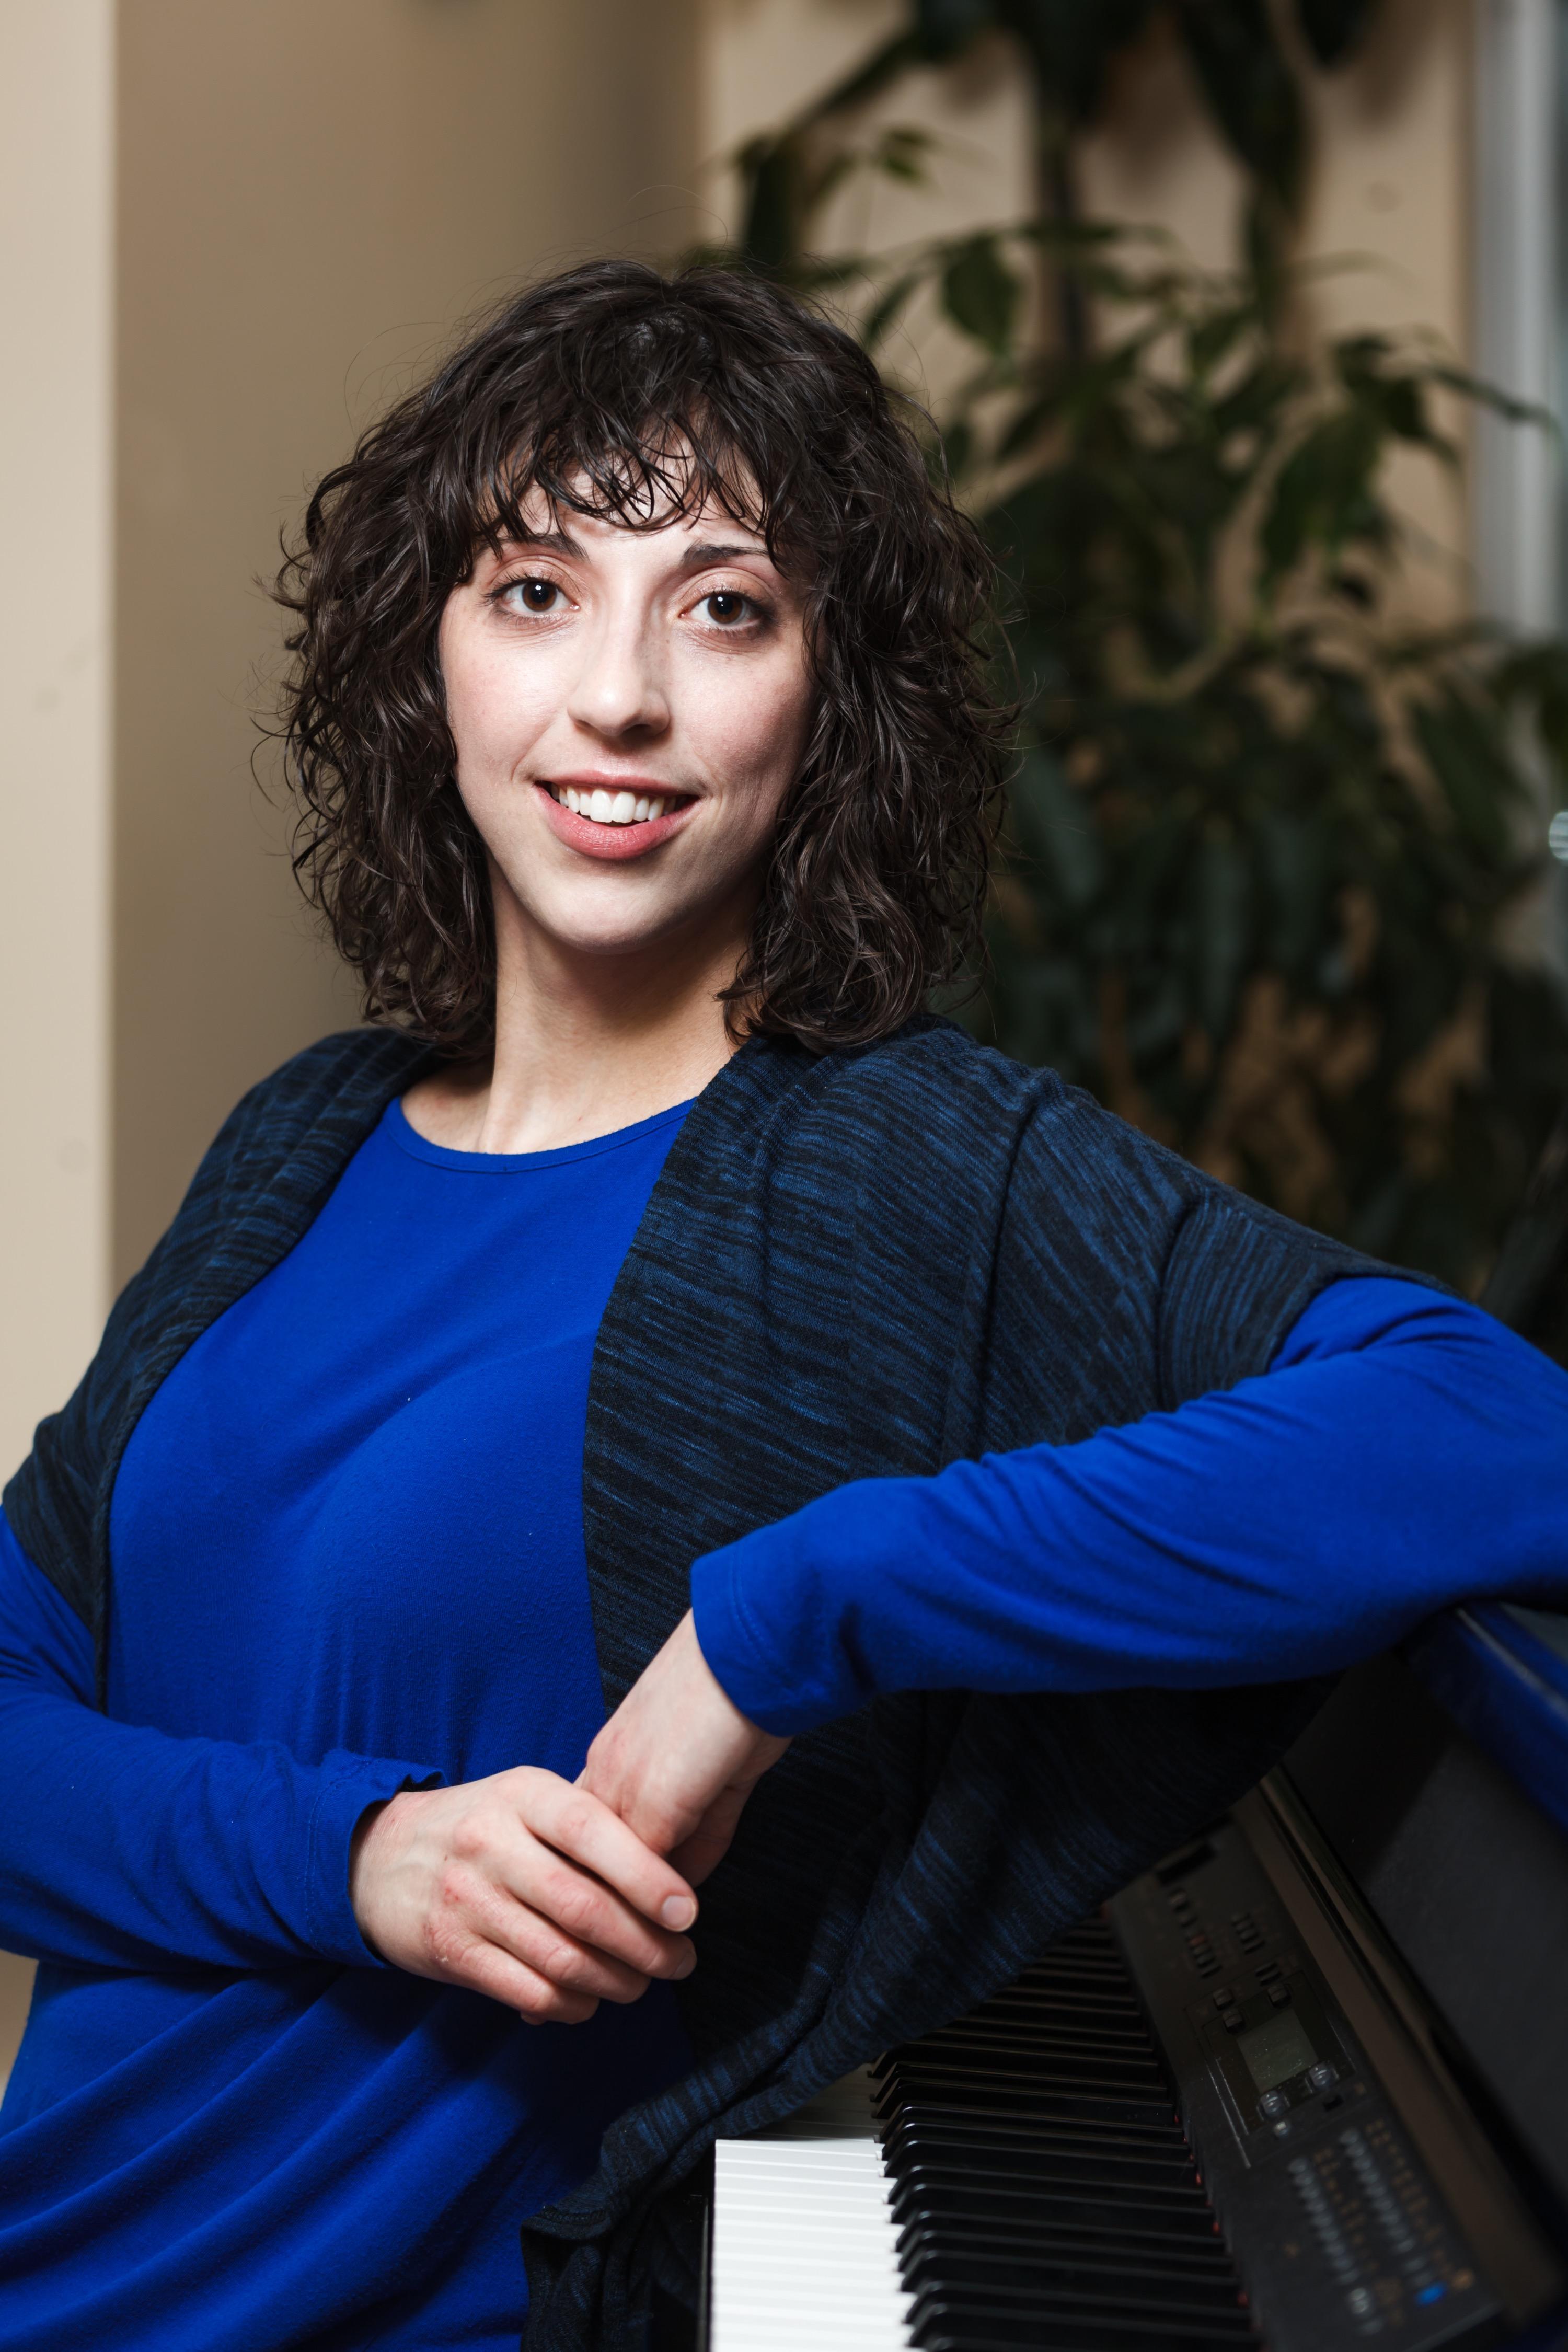 Mackenzie Costron. Accredited Music Therapist. Registered Counselling Therapist. Halifax Nova Scotia. Mental Health. Grief. Loss. Bereavement. Dementia. Alzheimer's.